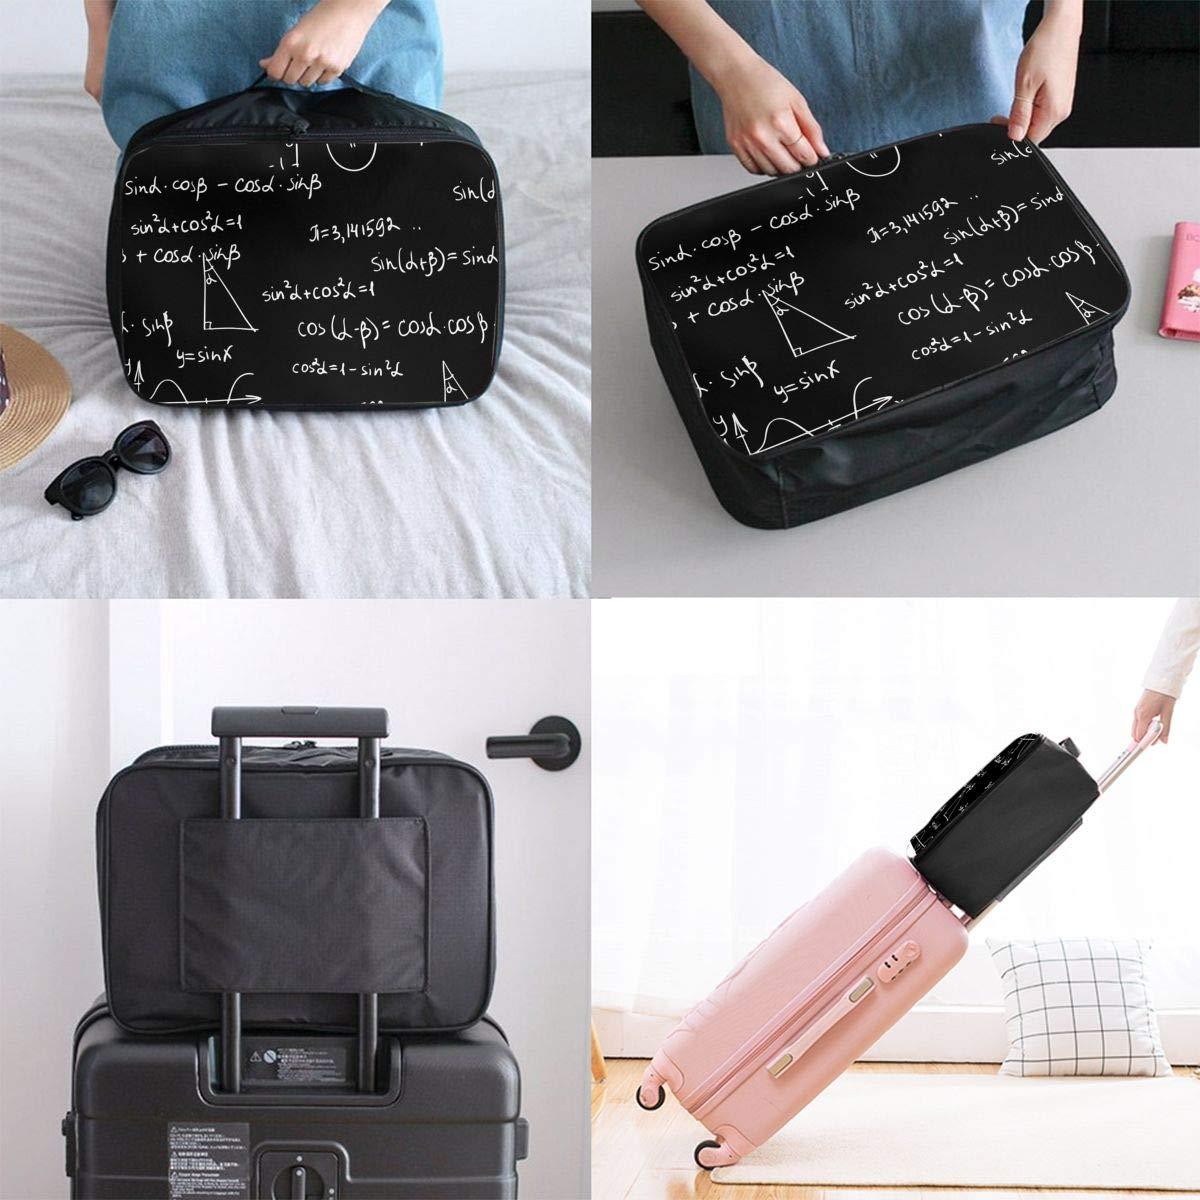 YueLJB Maths Formula Lightweight Large Capacity Portable Luggage Bag Travel Duffel Bag Storage Carry Luggage Duffle Tote Bag